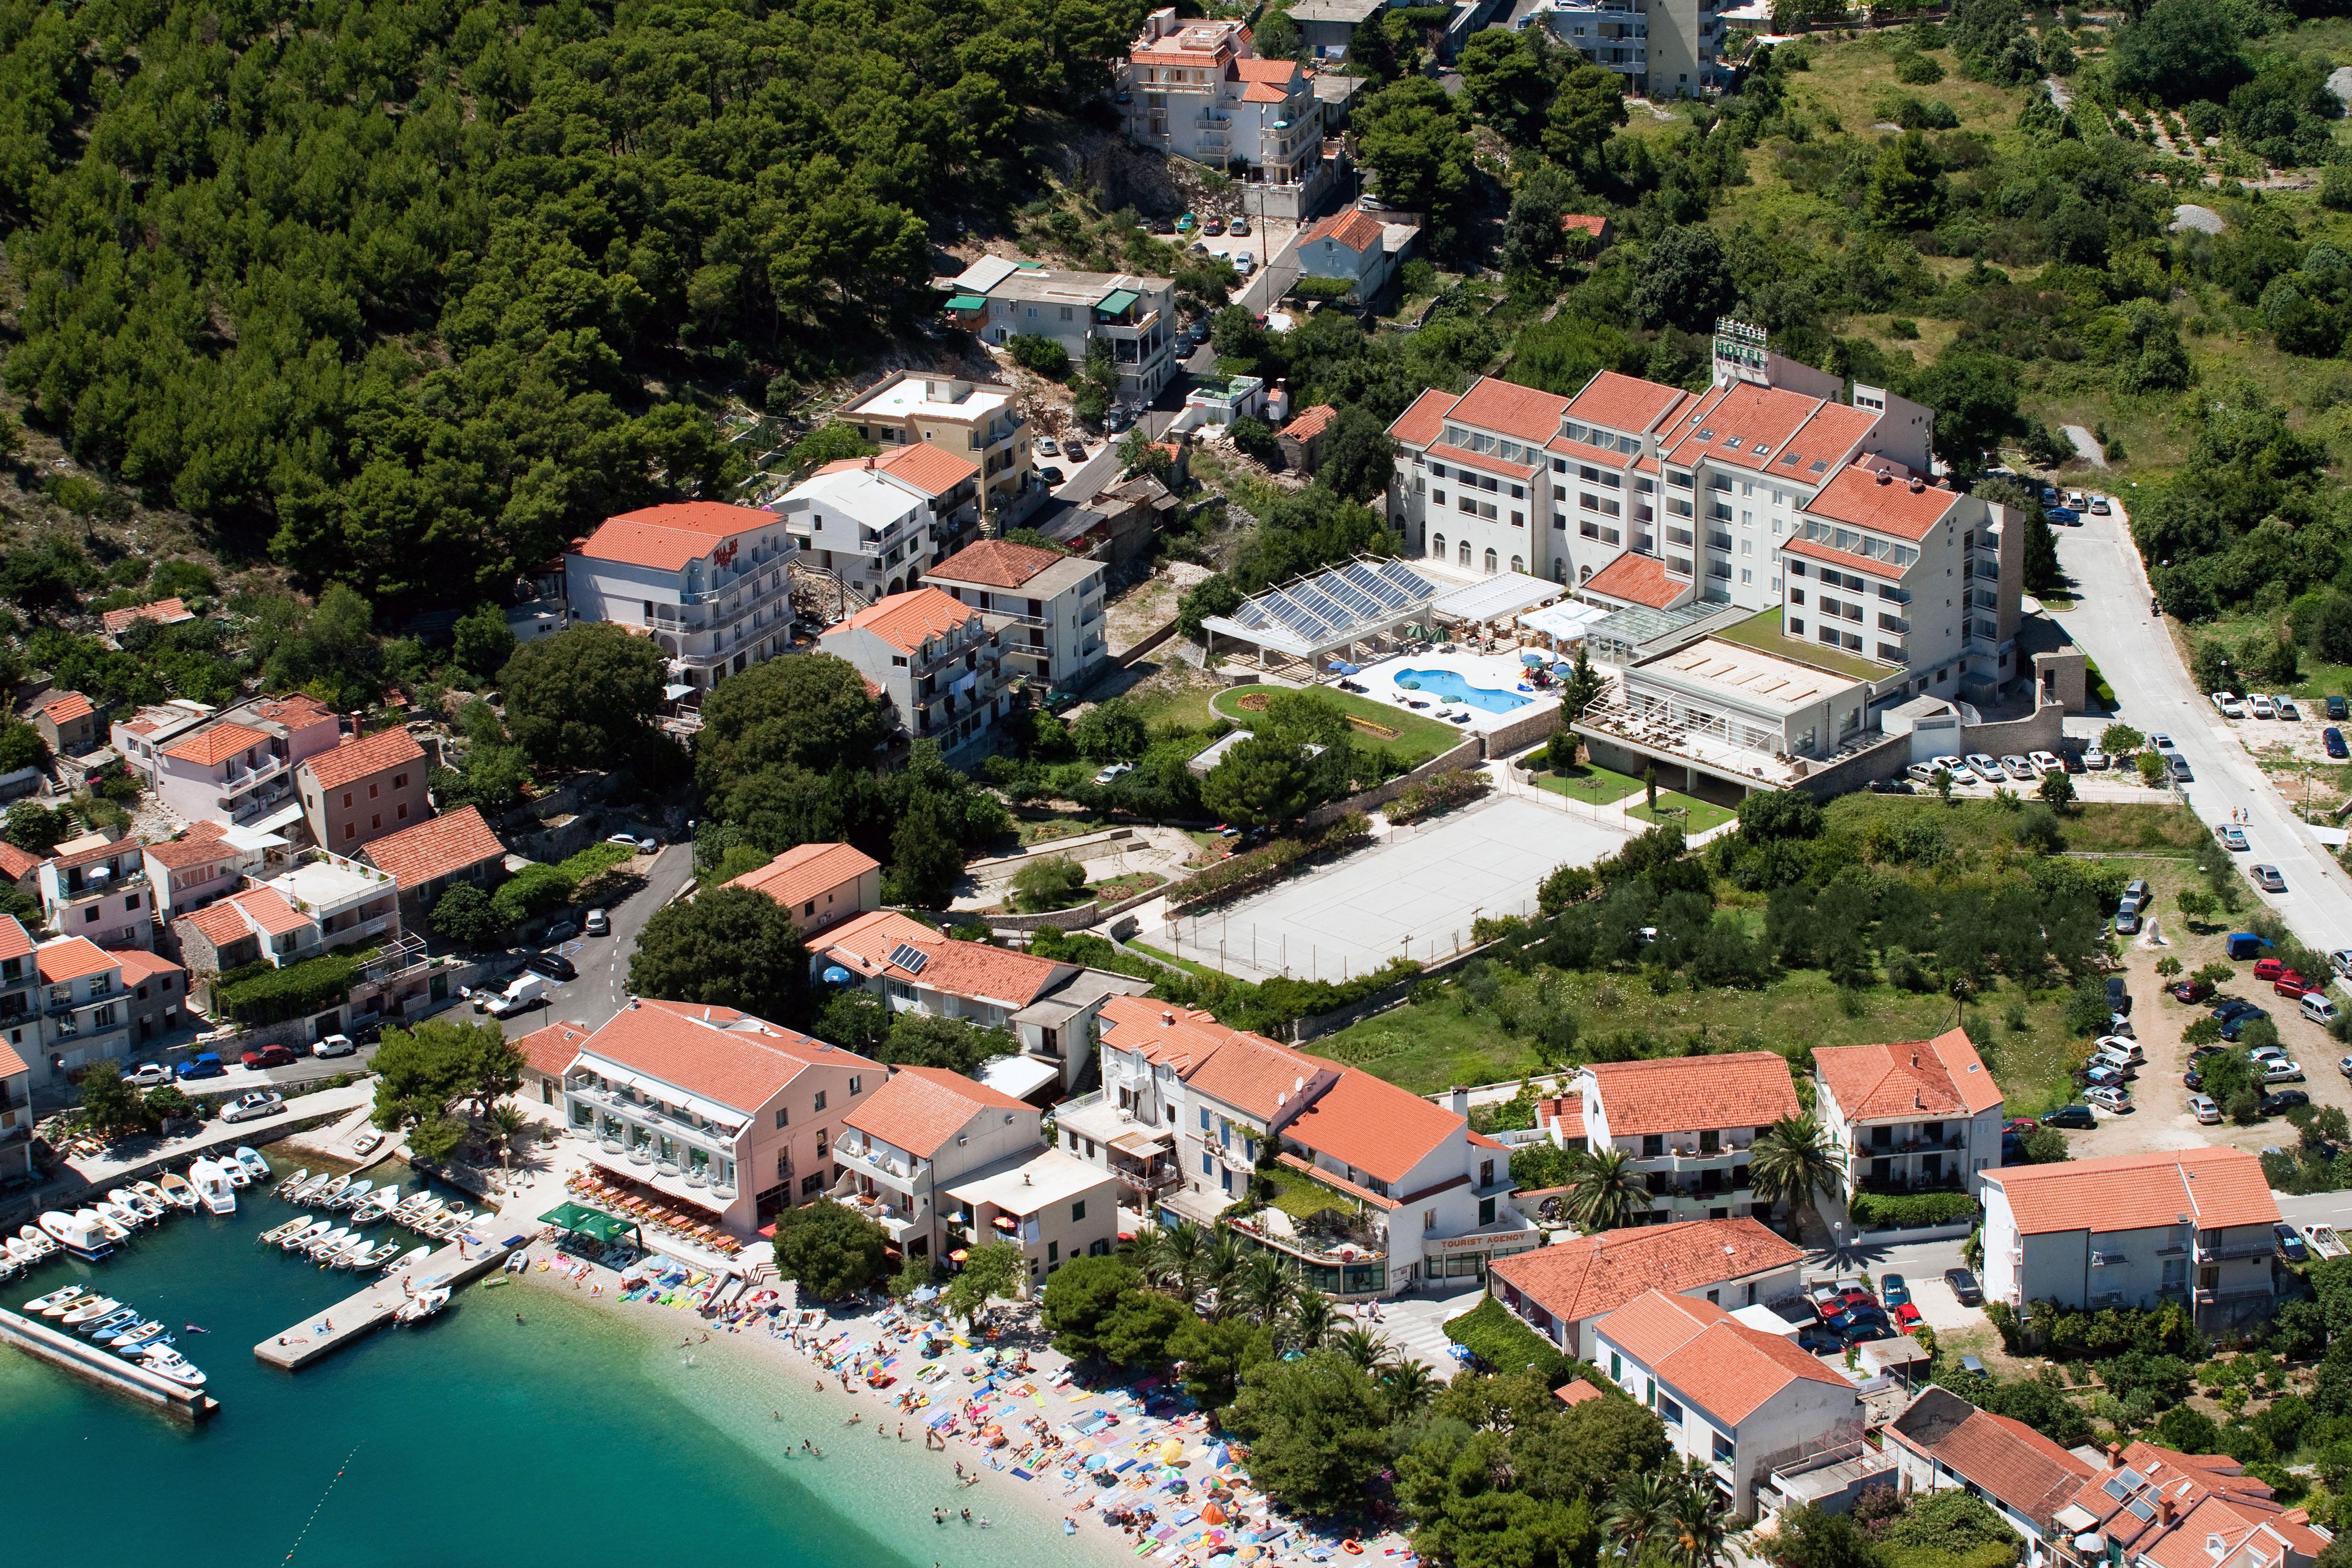 CHORWACJA - LATO 2020: Hotel Quercus****, 8 dni (29.08-05.09.2020 r.), all inclusive: 1890,00 PLN/os. dorosła